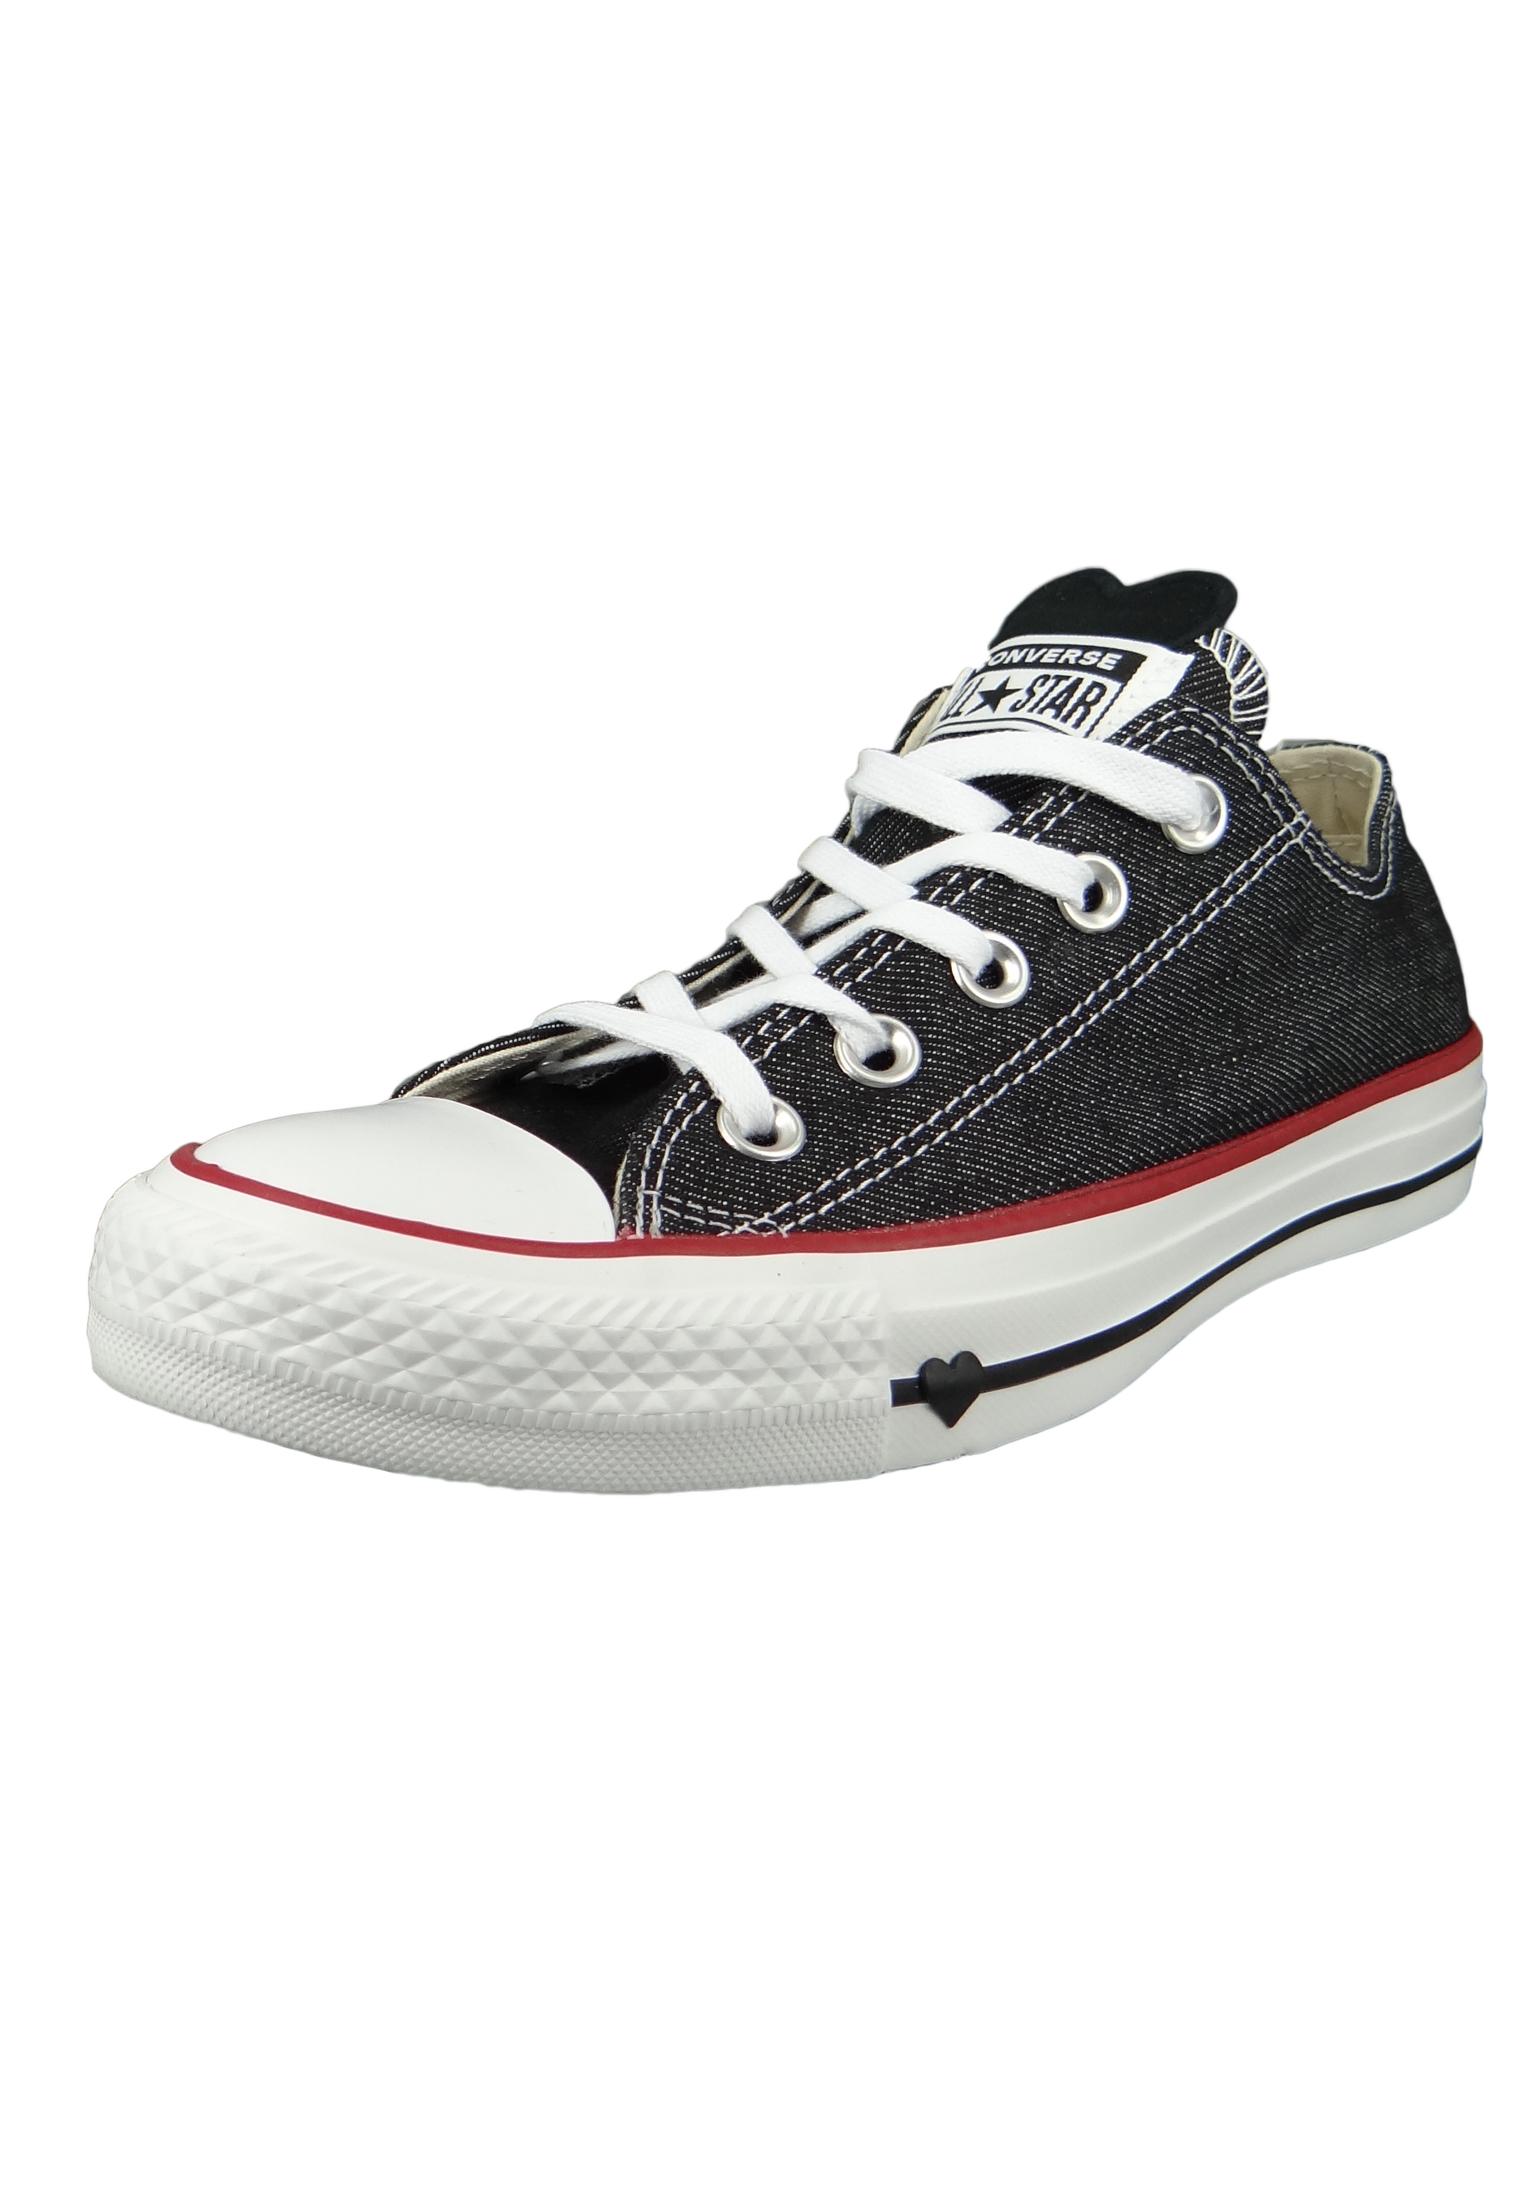 Converse Chucks 163309C Anthrazit Chuck Taylor All Star OX Black White Garnet